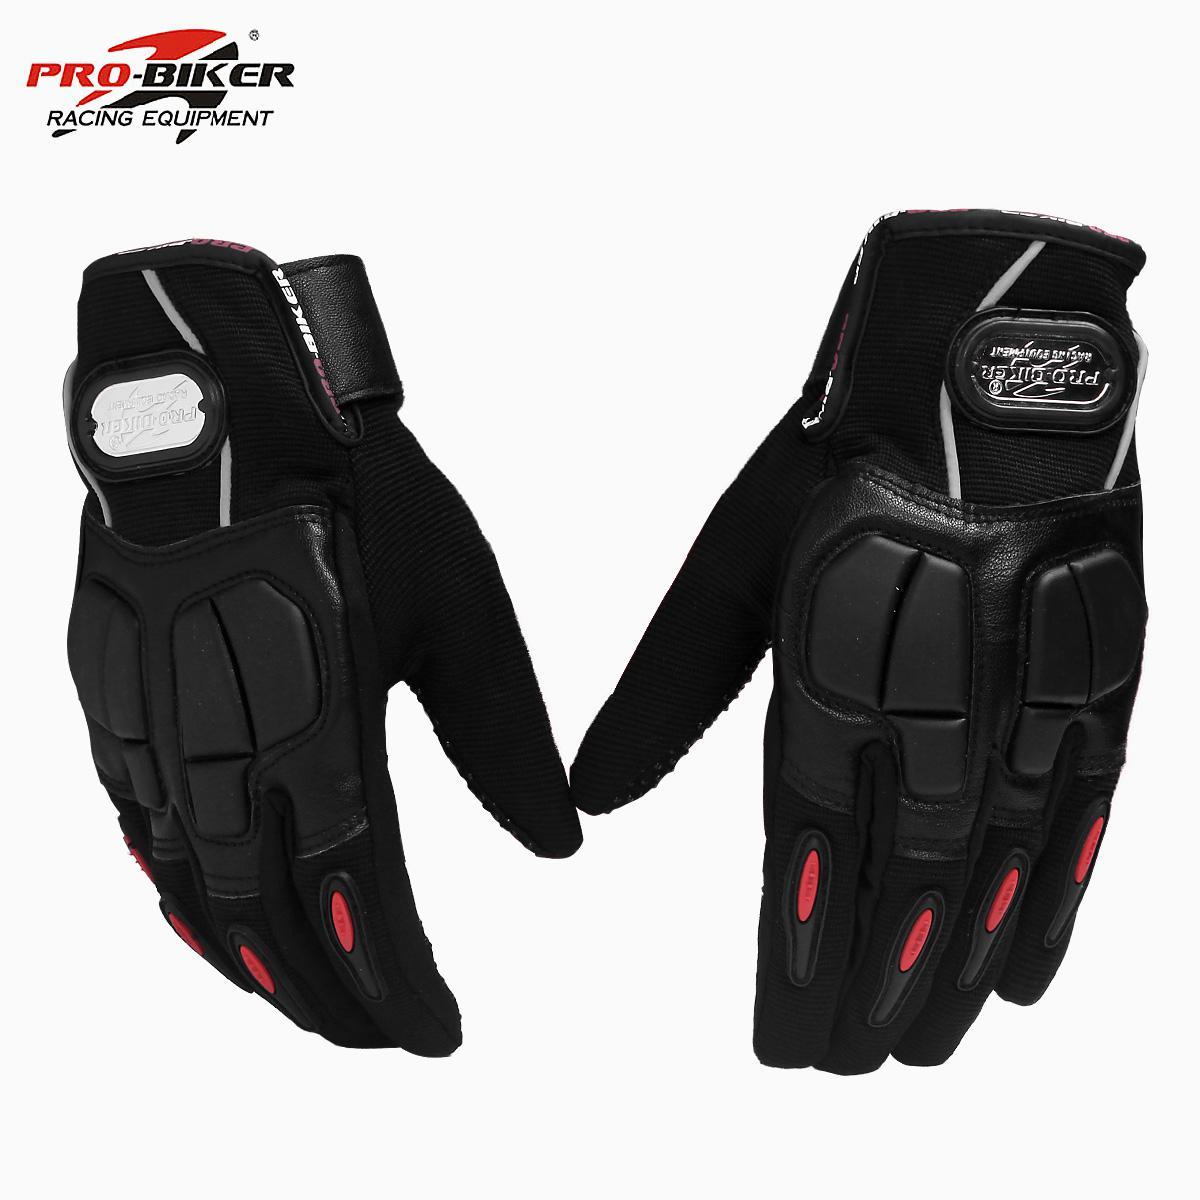 Mens gloves summer - 2017 Wholesale Pro Biker Motorcycle Gloves Summer Breathable Men S Knight Gloves Black M L Xl From Simmer 17 63 Dhgate Com